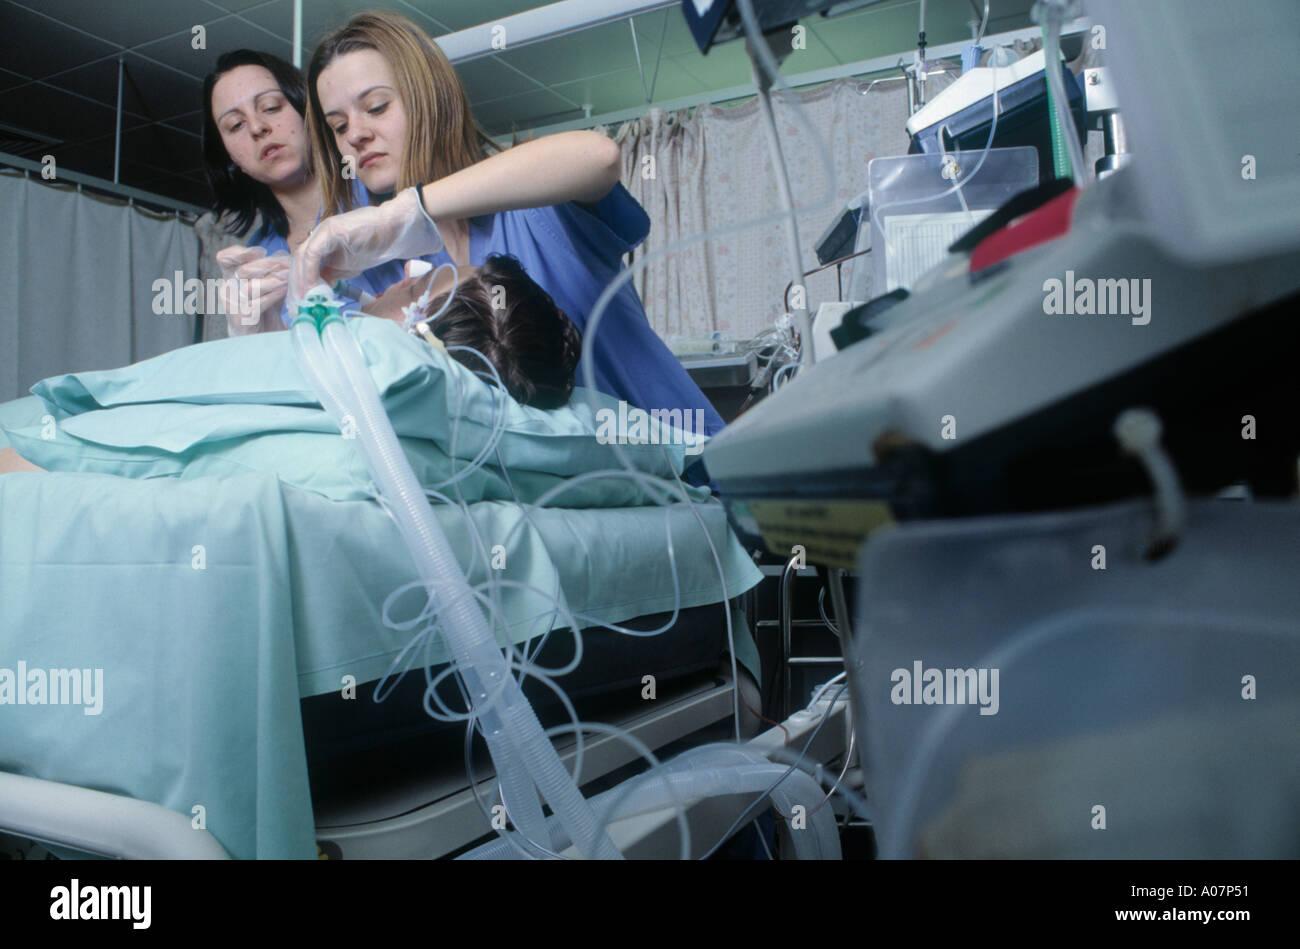 Spanish Nurses put a patient on oxygen in intensive care unit NHS hospital Blackburn, UK Stock Photo